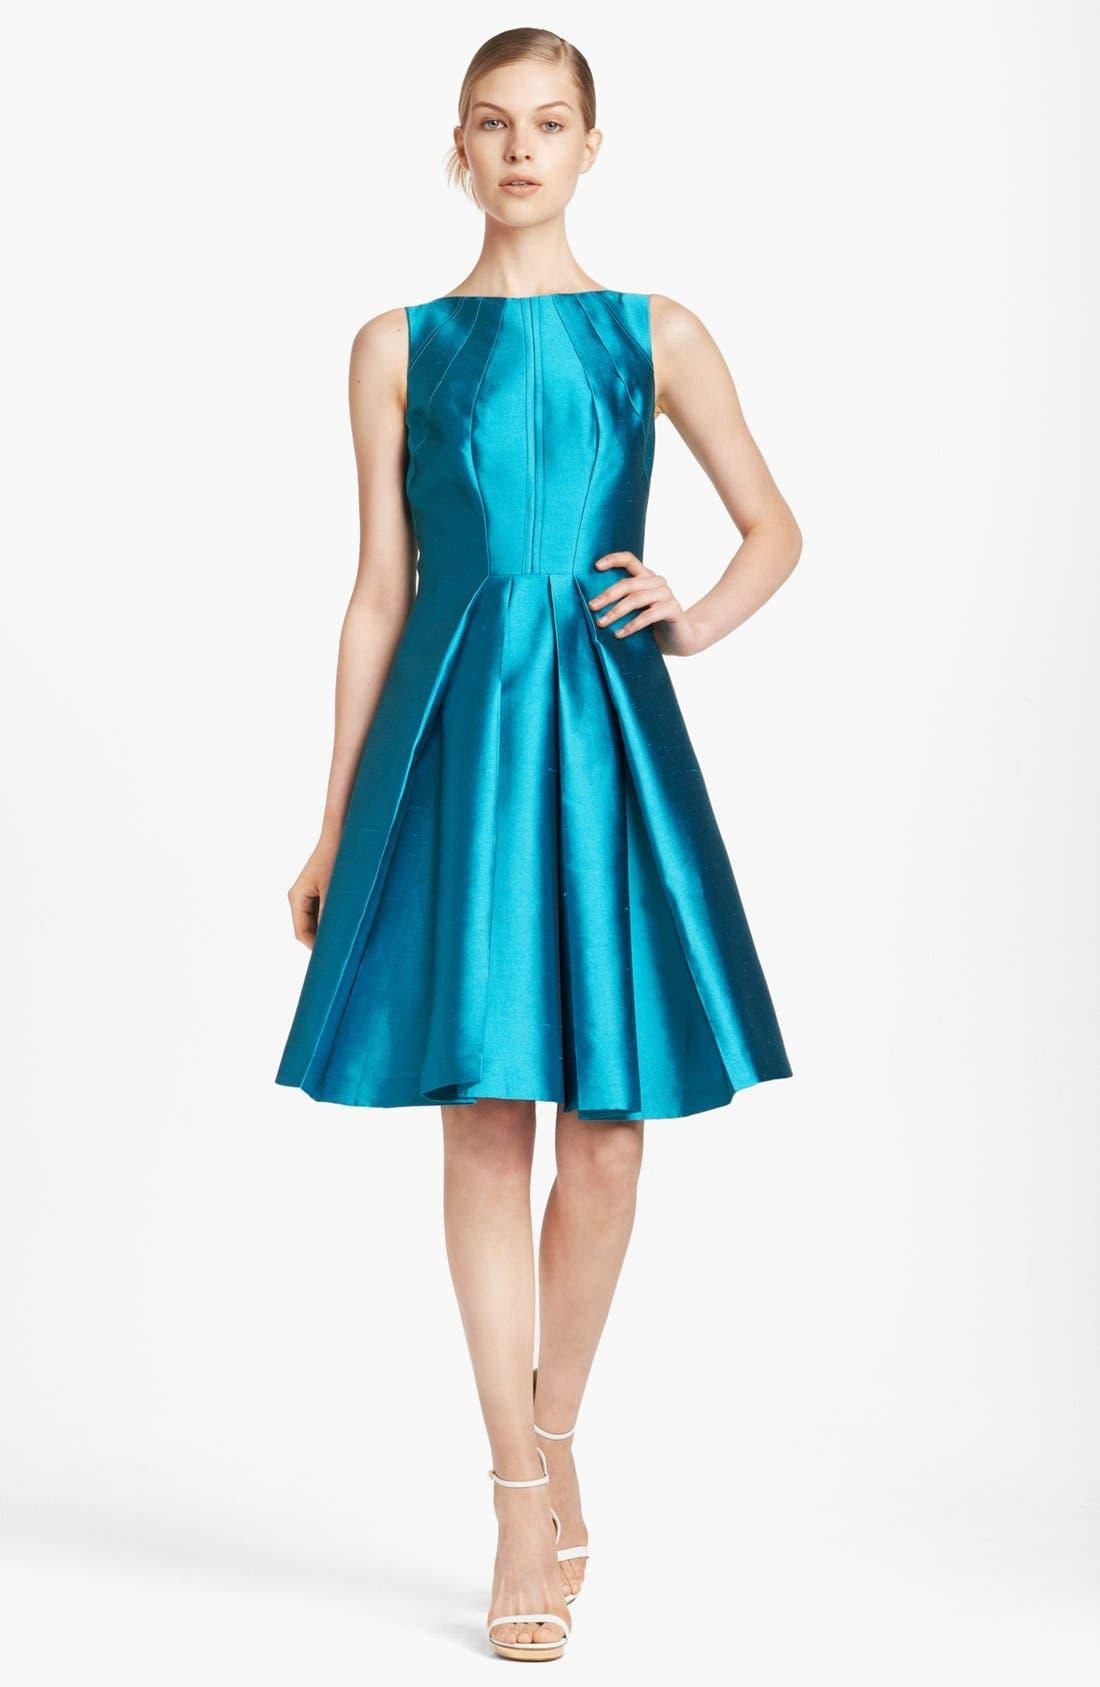 Alternate Image 1 Selected - Michael Kors Seamed Silk & Wool Dress